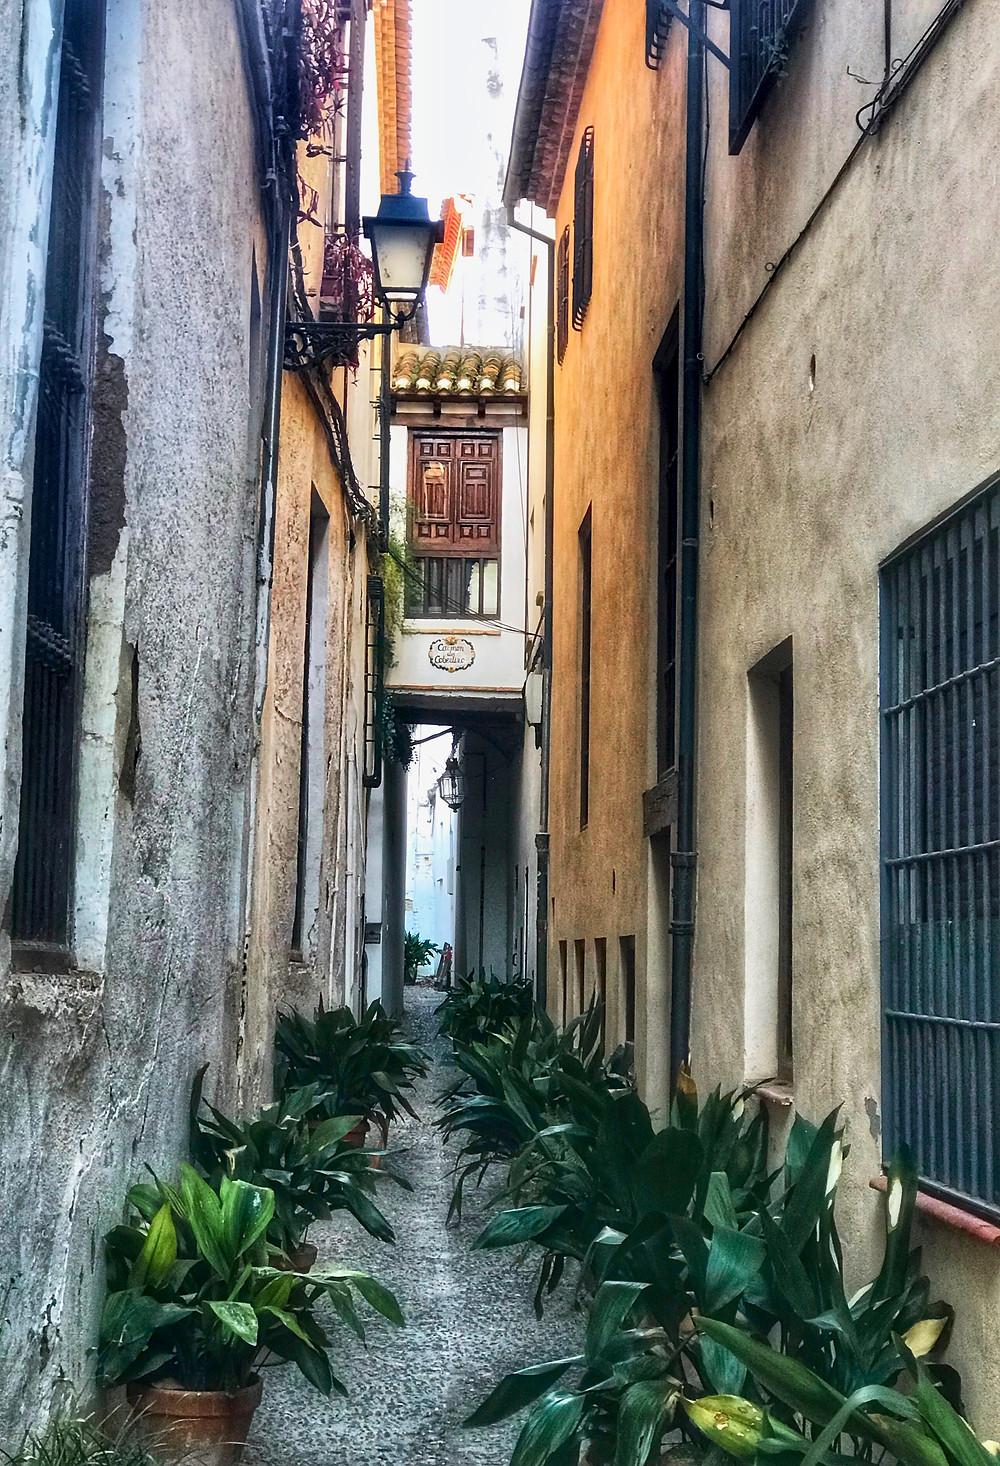 tiny cobbled land in Granada's Albaicín neighborhood